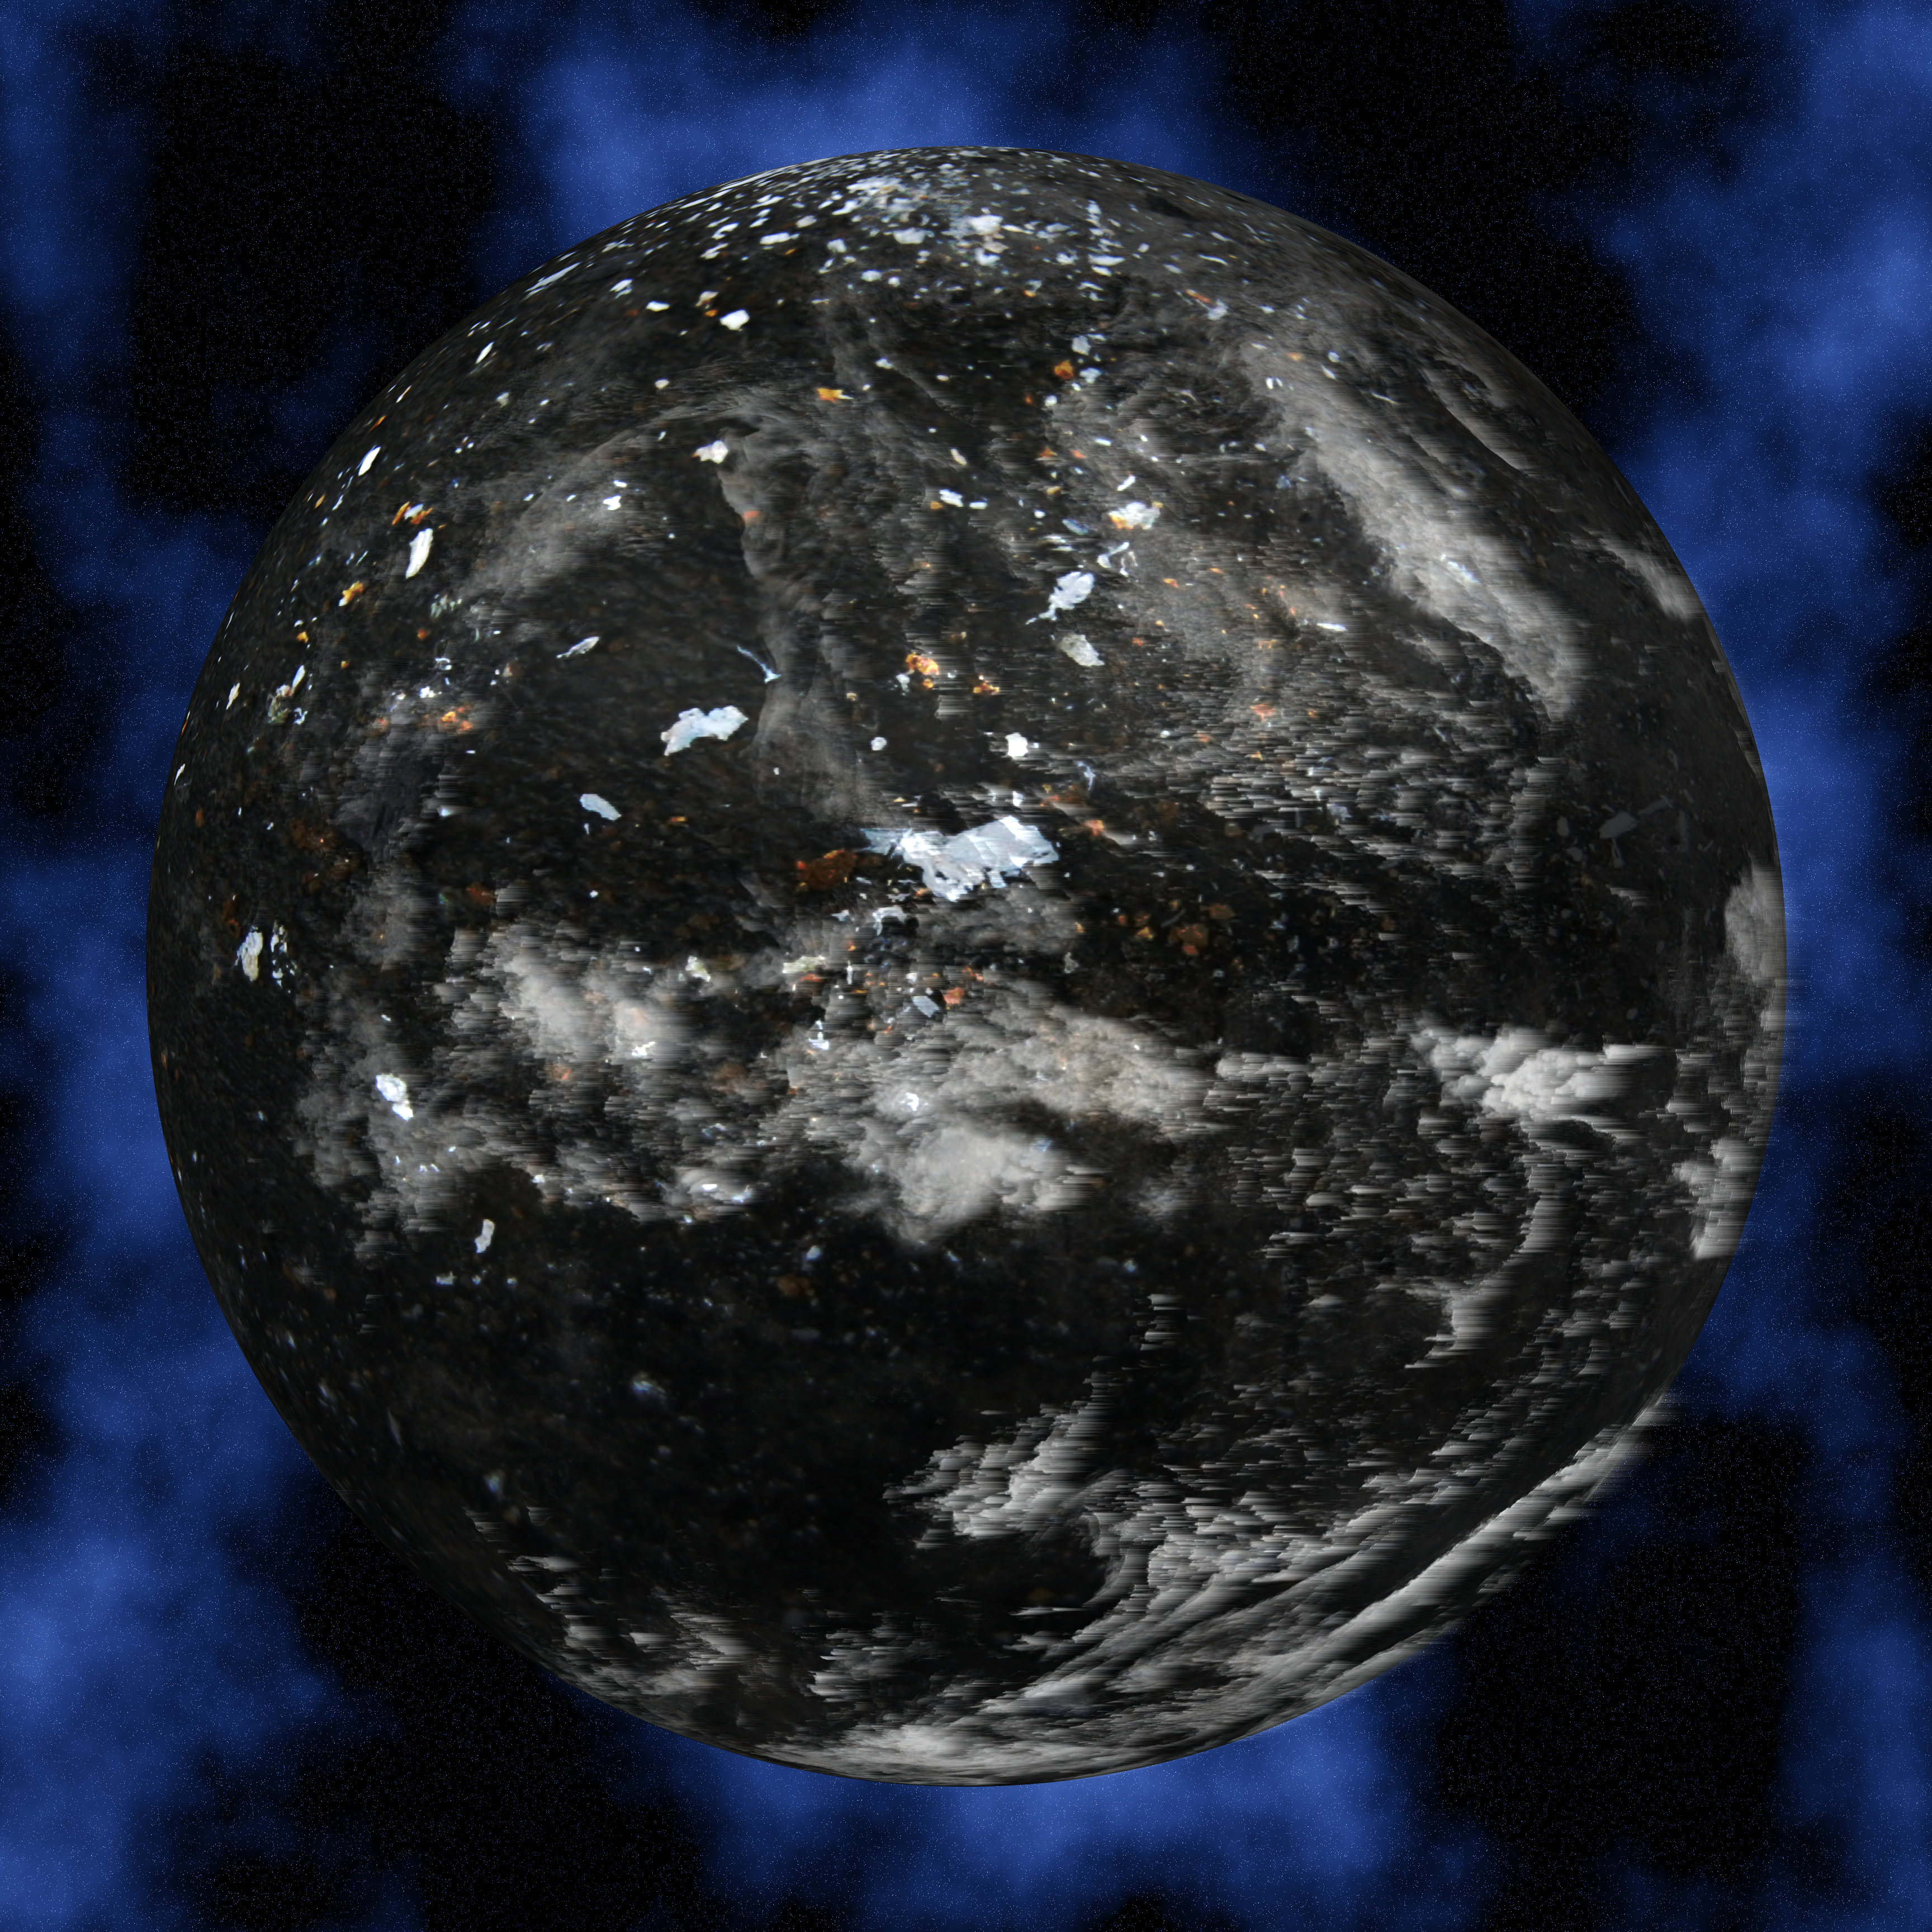 El Planeta Tllll by Jakeukalane